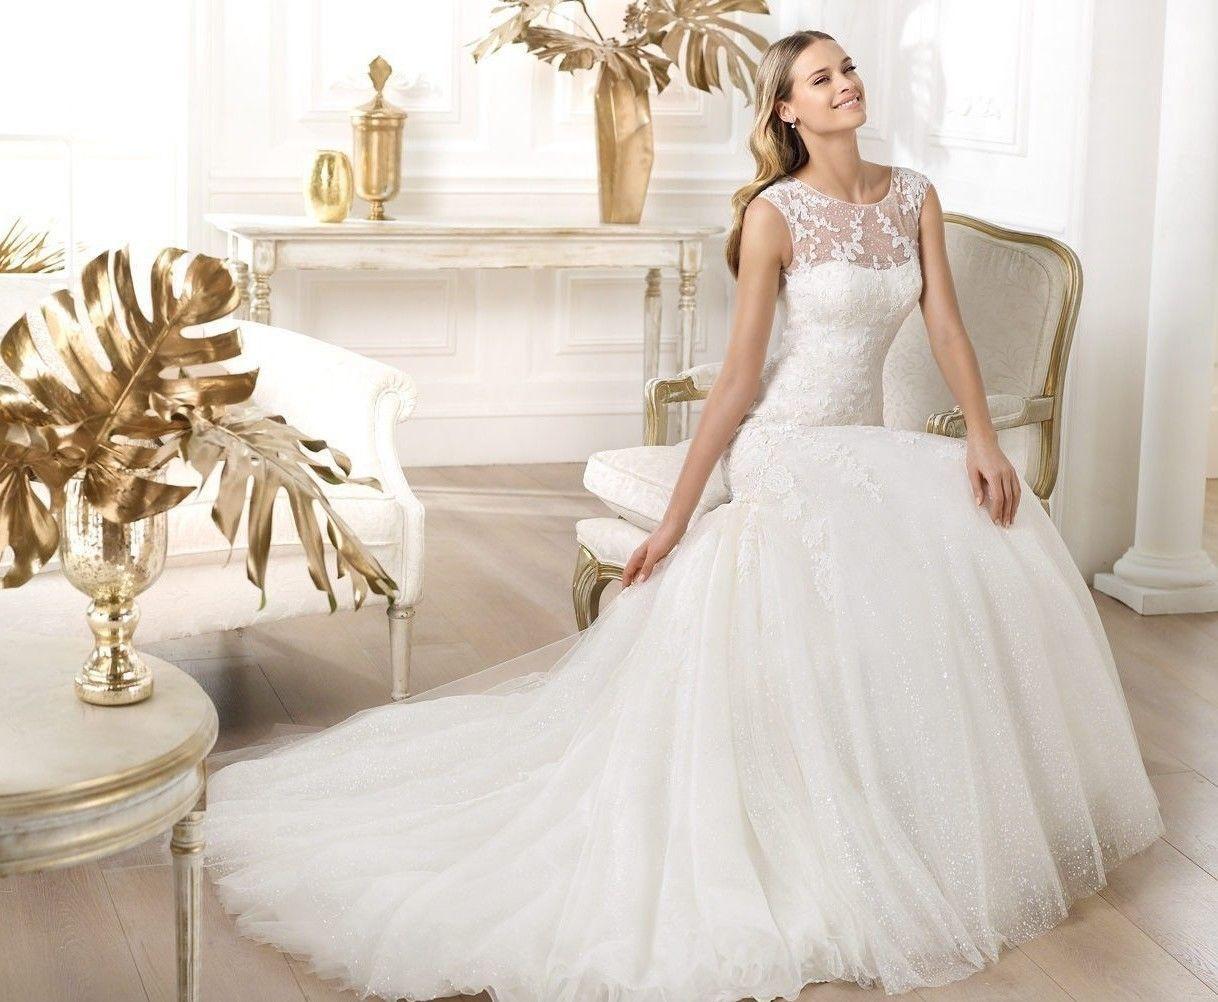 100+ Wedding Dress Rental Denver - Country Dresses for Weddings ...